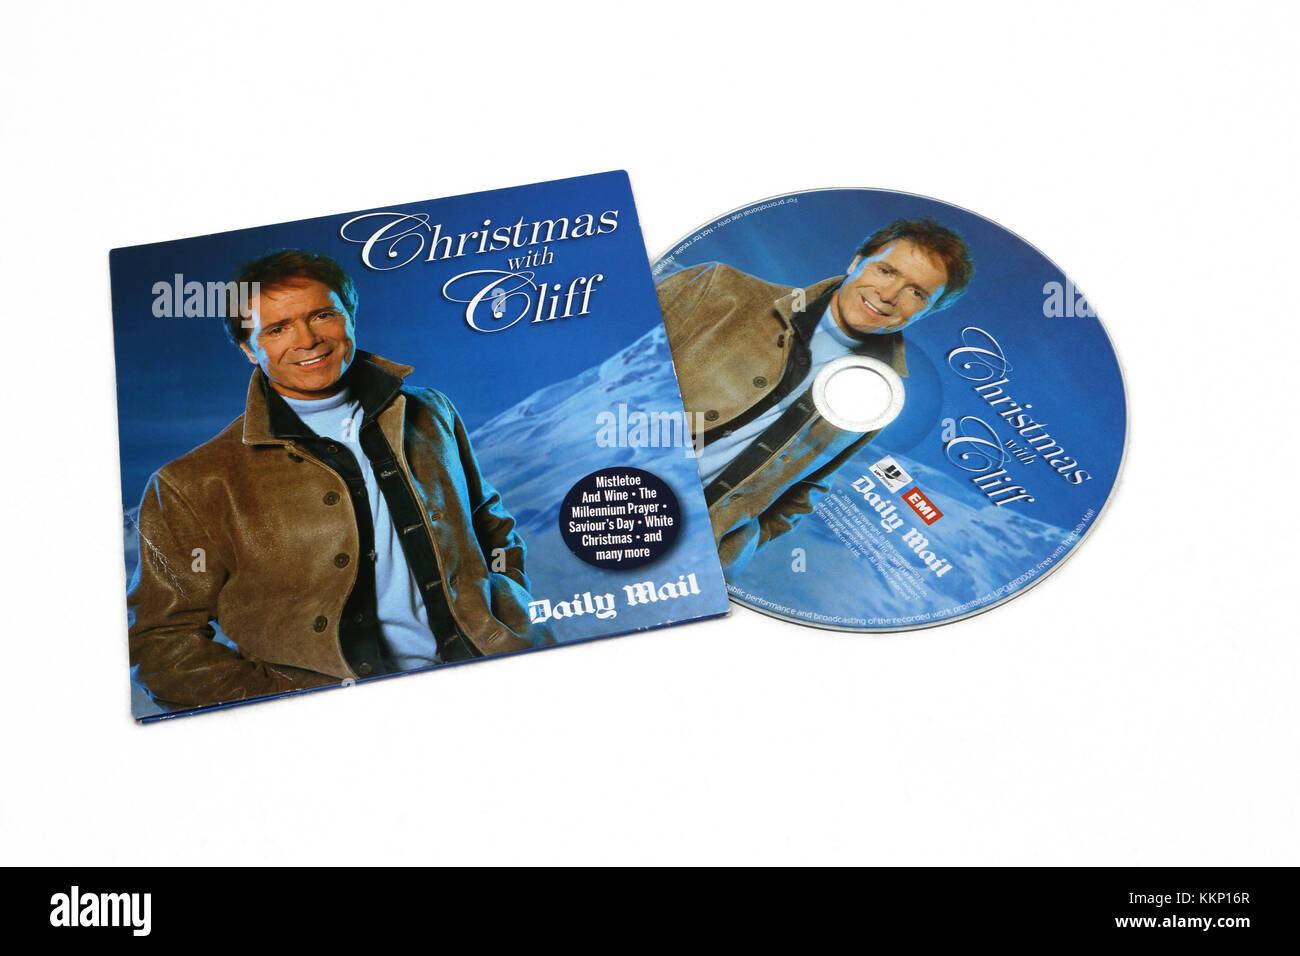 Christmas Album Stock Photos & Christmas Album Stock Images - Alamy